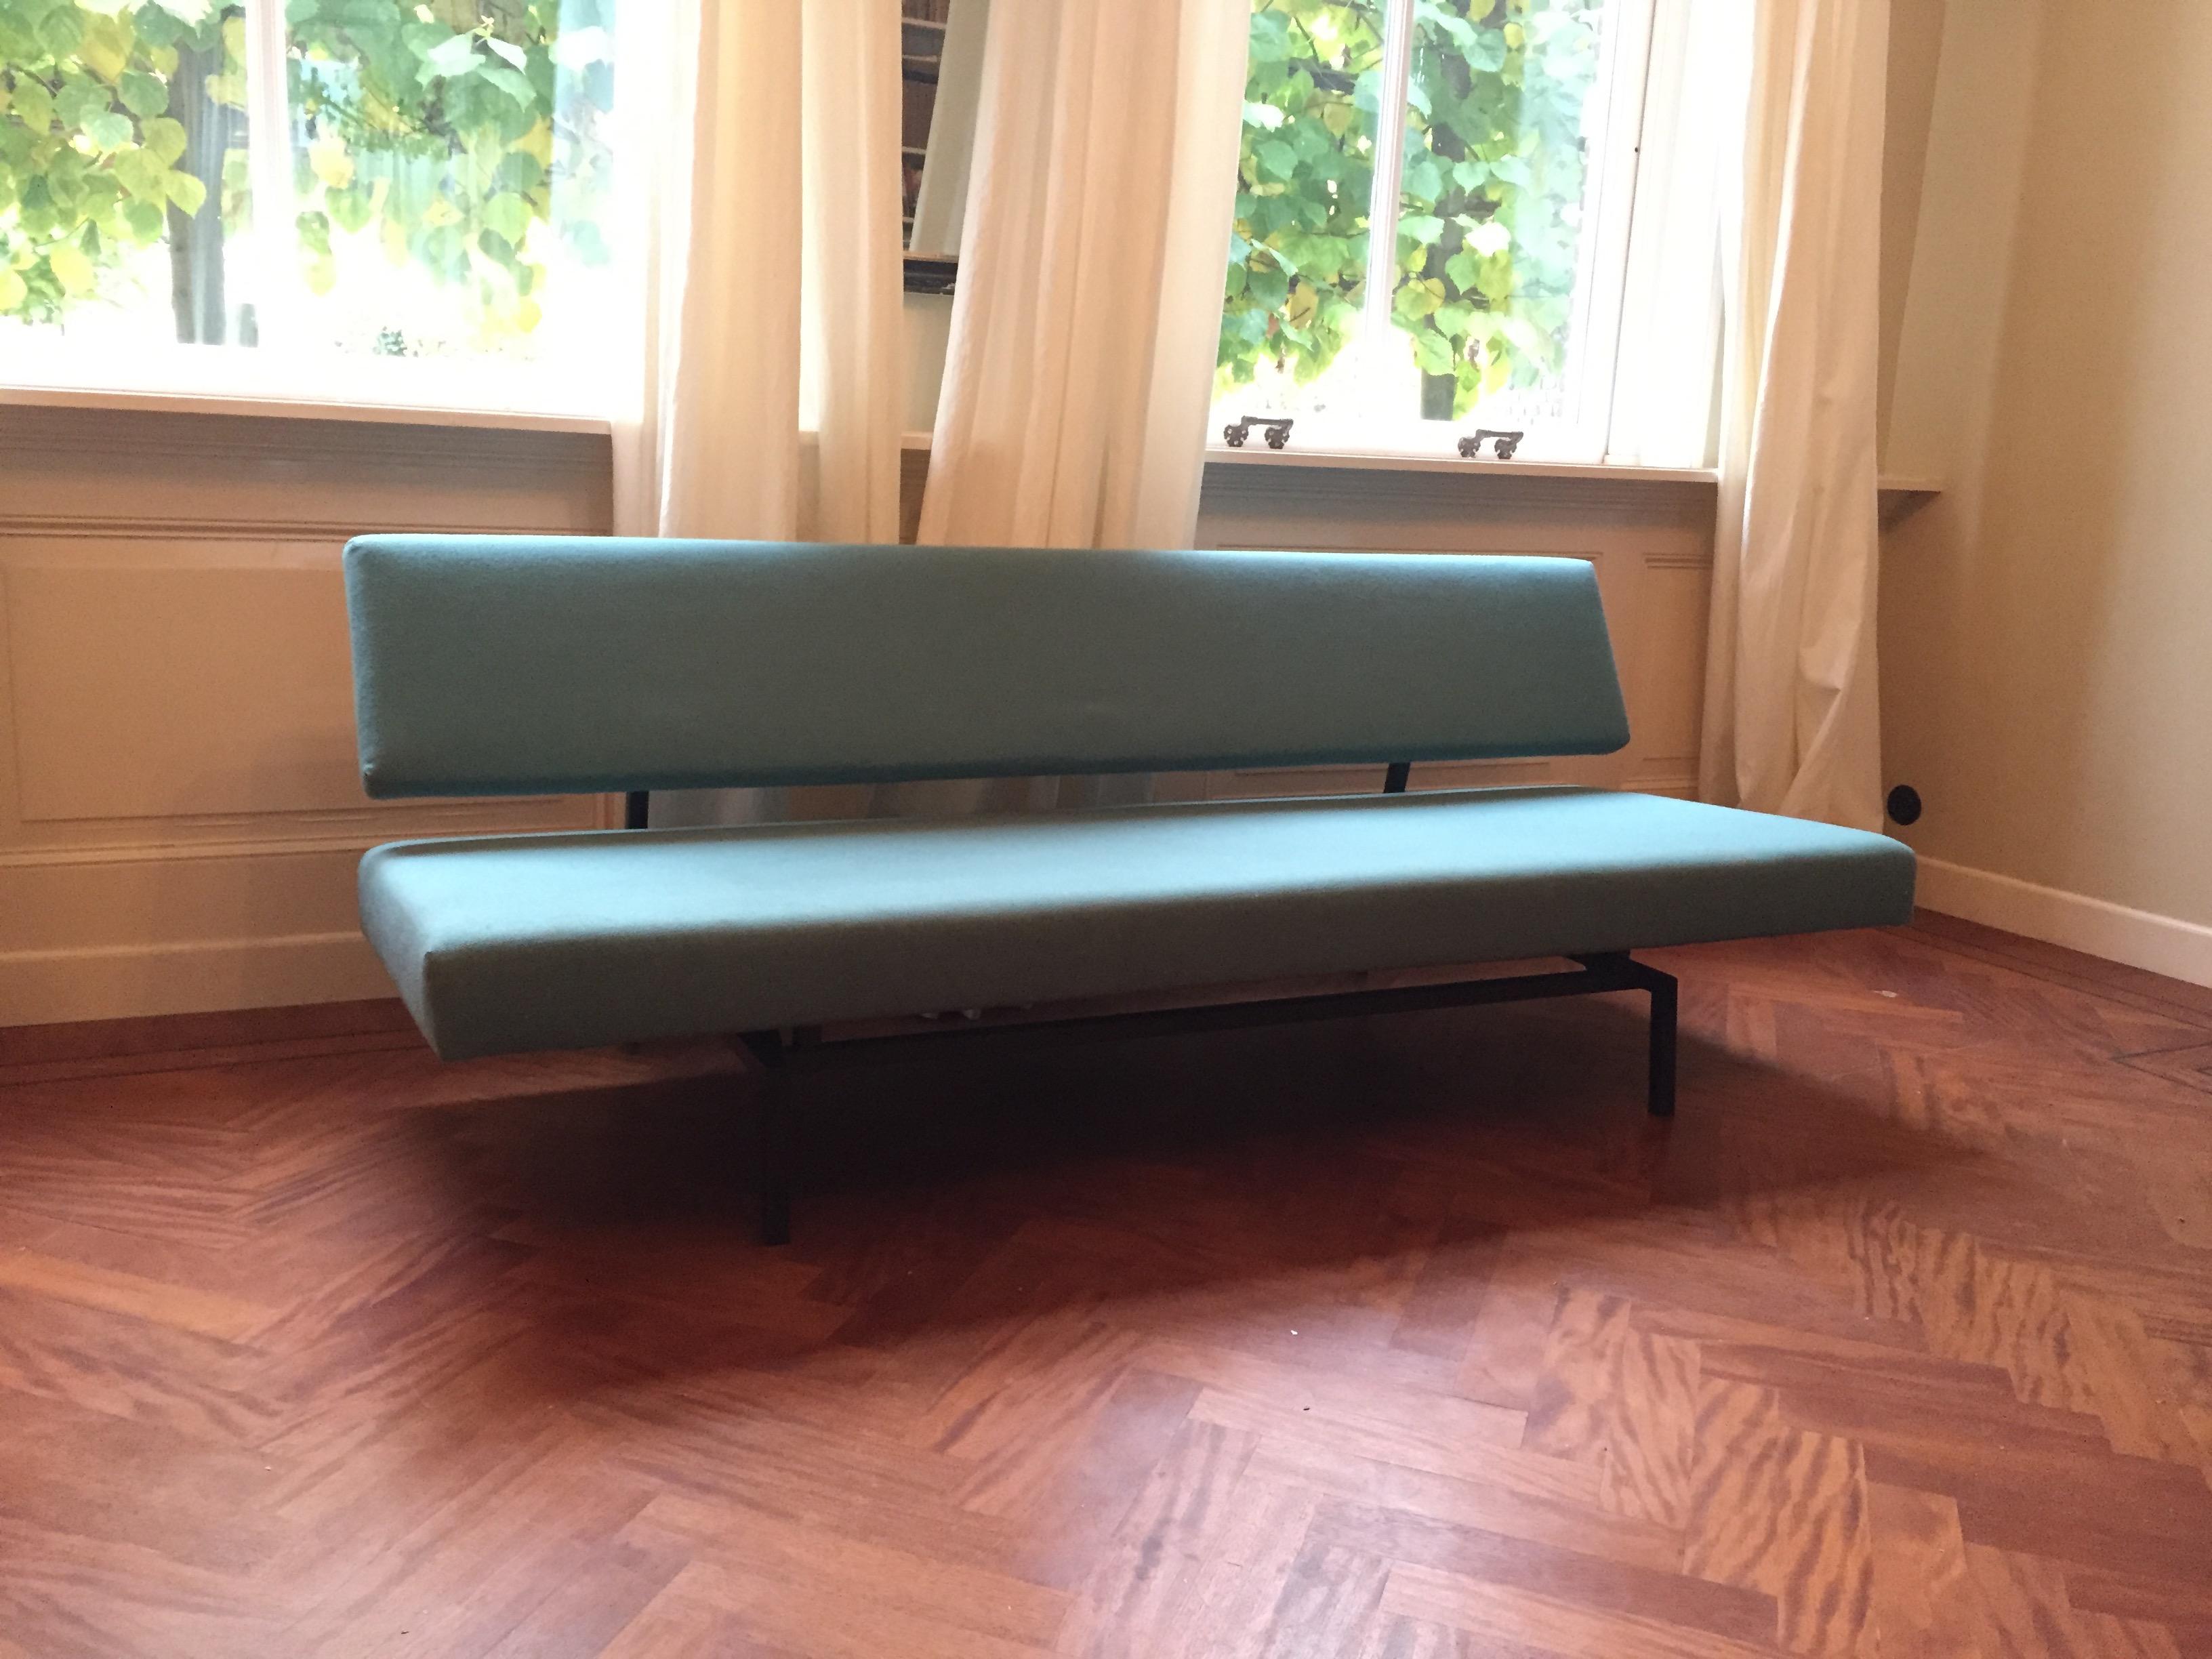 Spectrum (Sleeping) Sofa. Designed by Martin Visser in 1960.